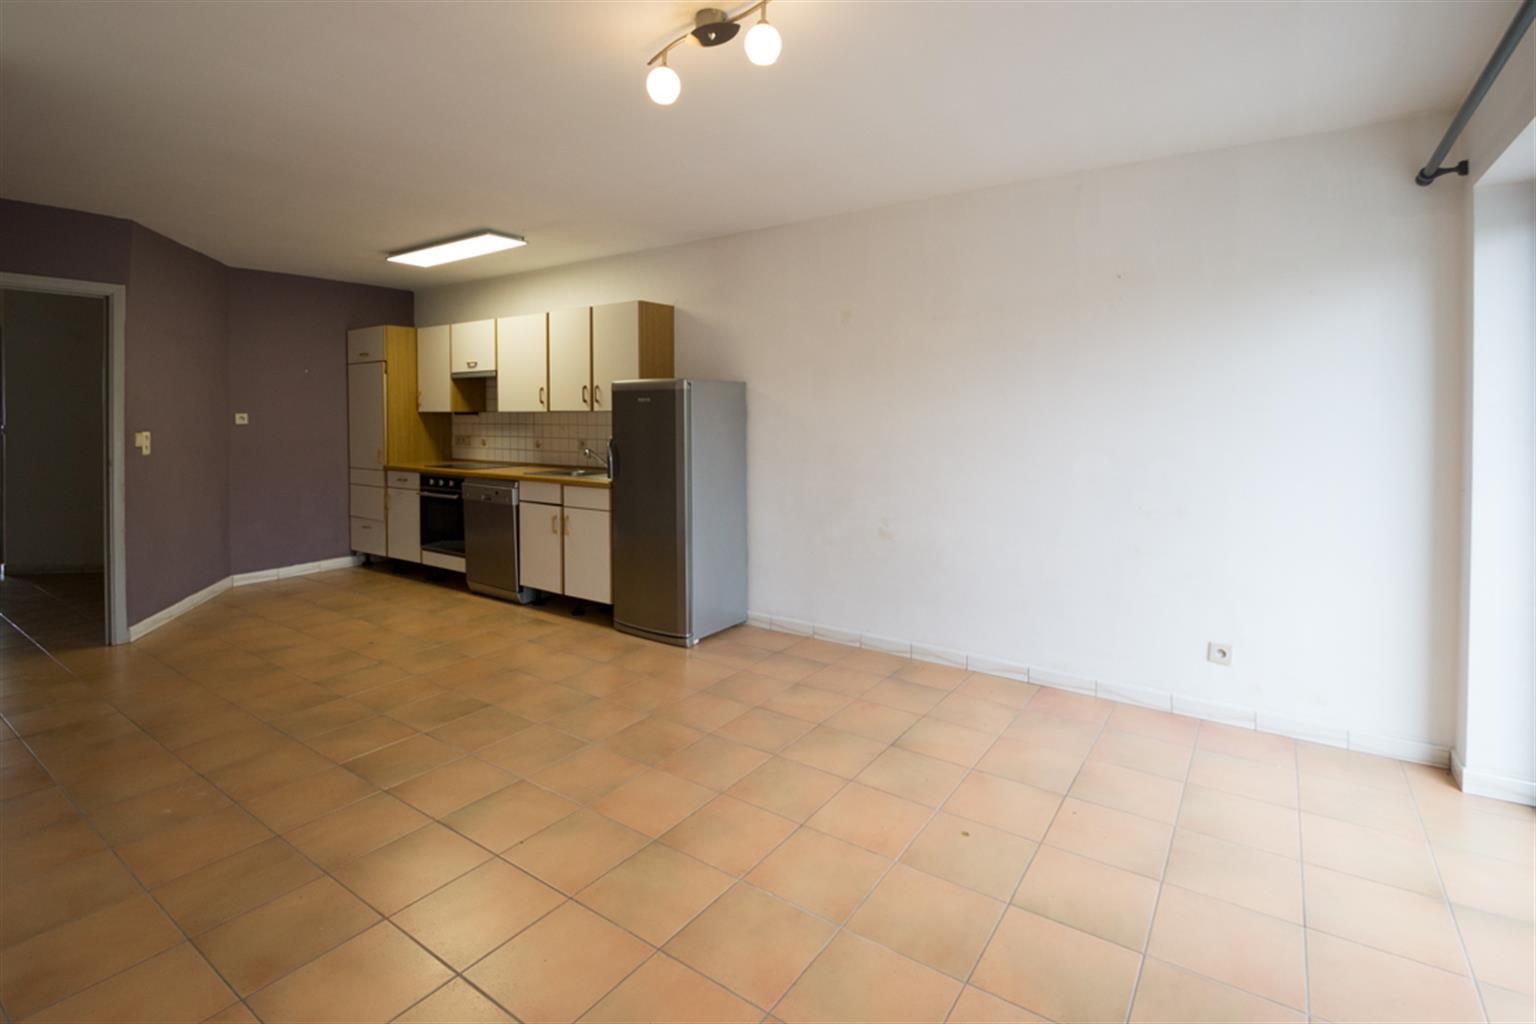 Appartement - Morlanwelz - #3991254-3